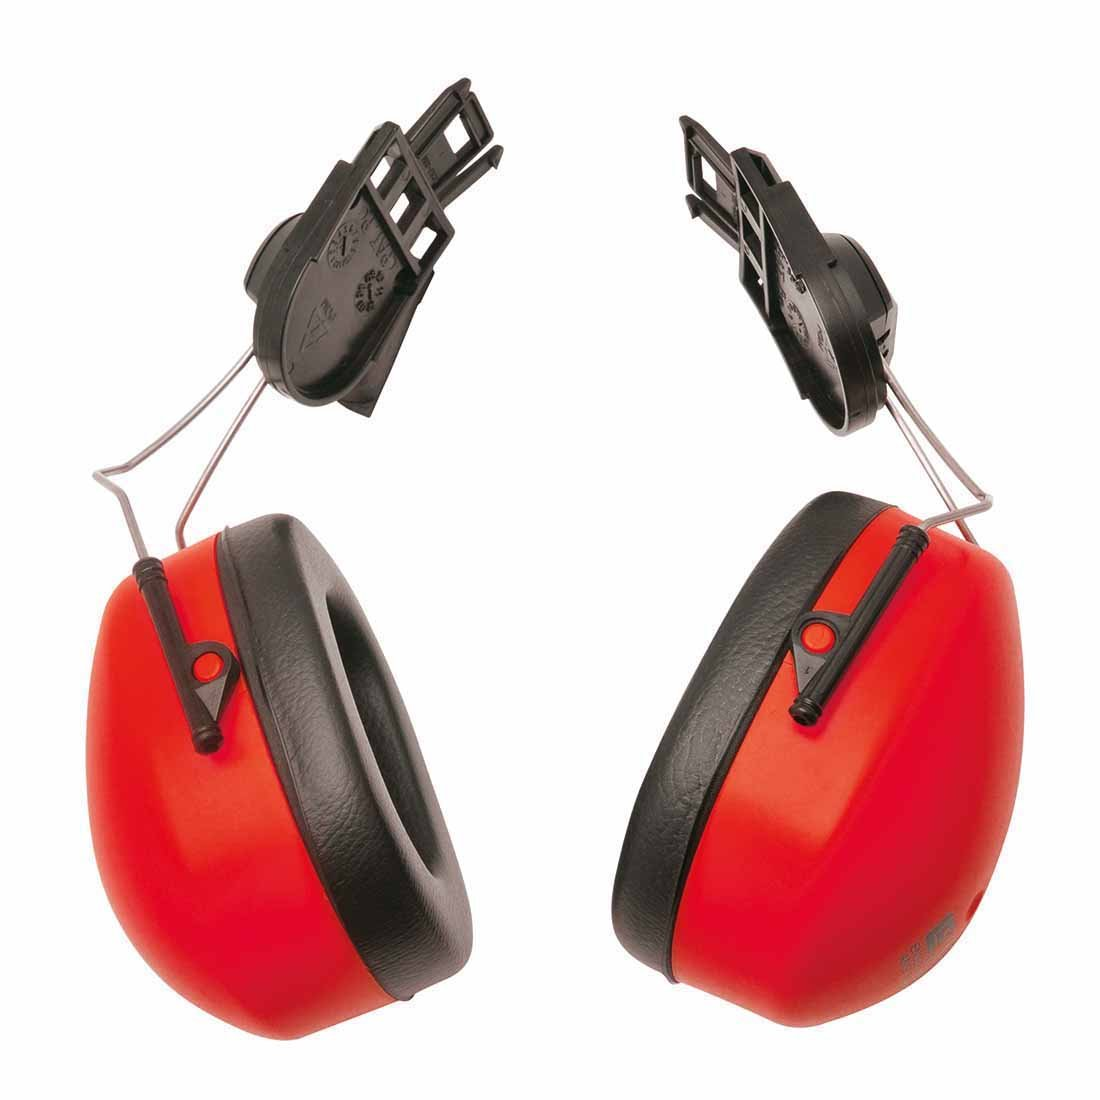 Portwest pw42rer serie PW42 Samsung Galaxy S3 MINI i8190 Protector de oí do, Regular, color rojo Portwest Clothing Ltd